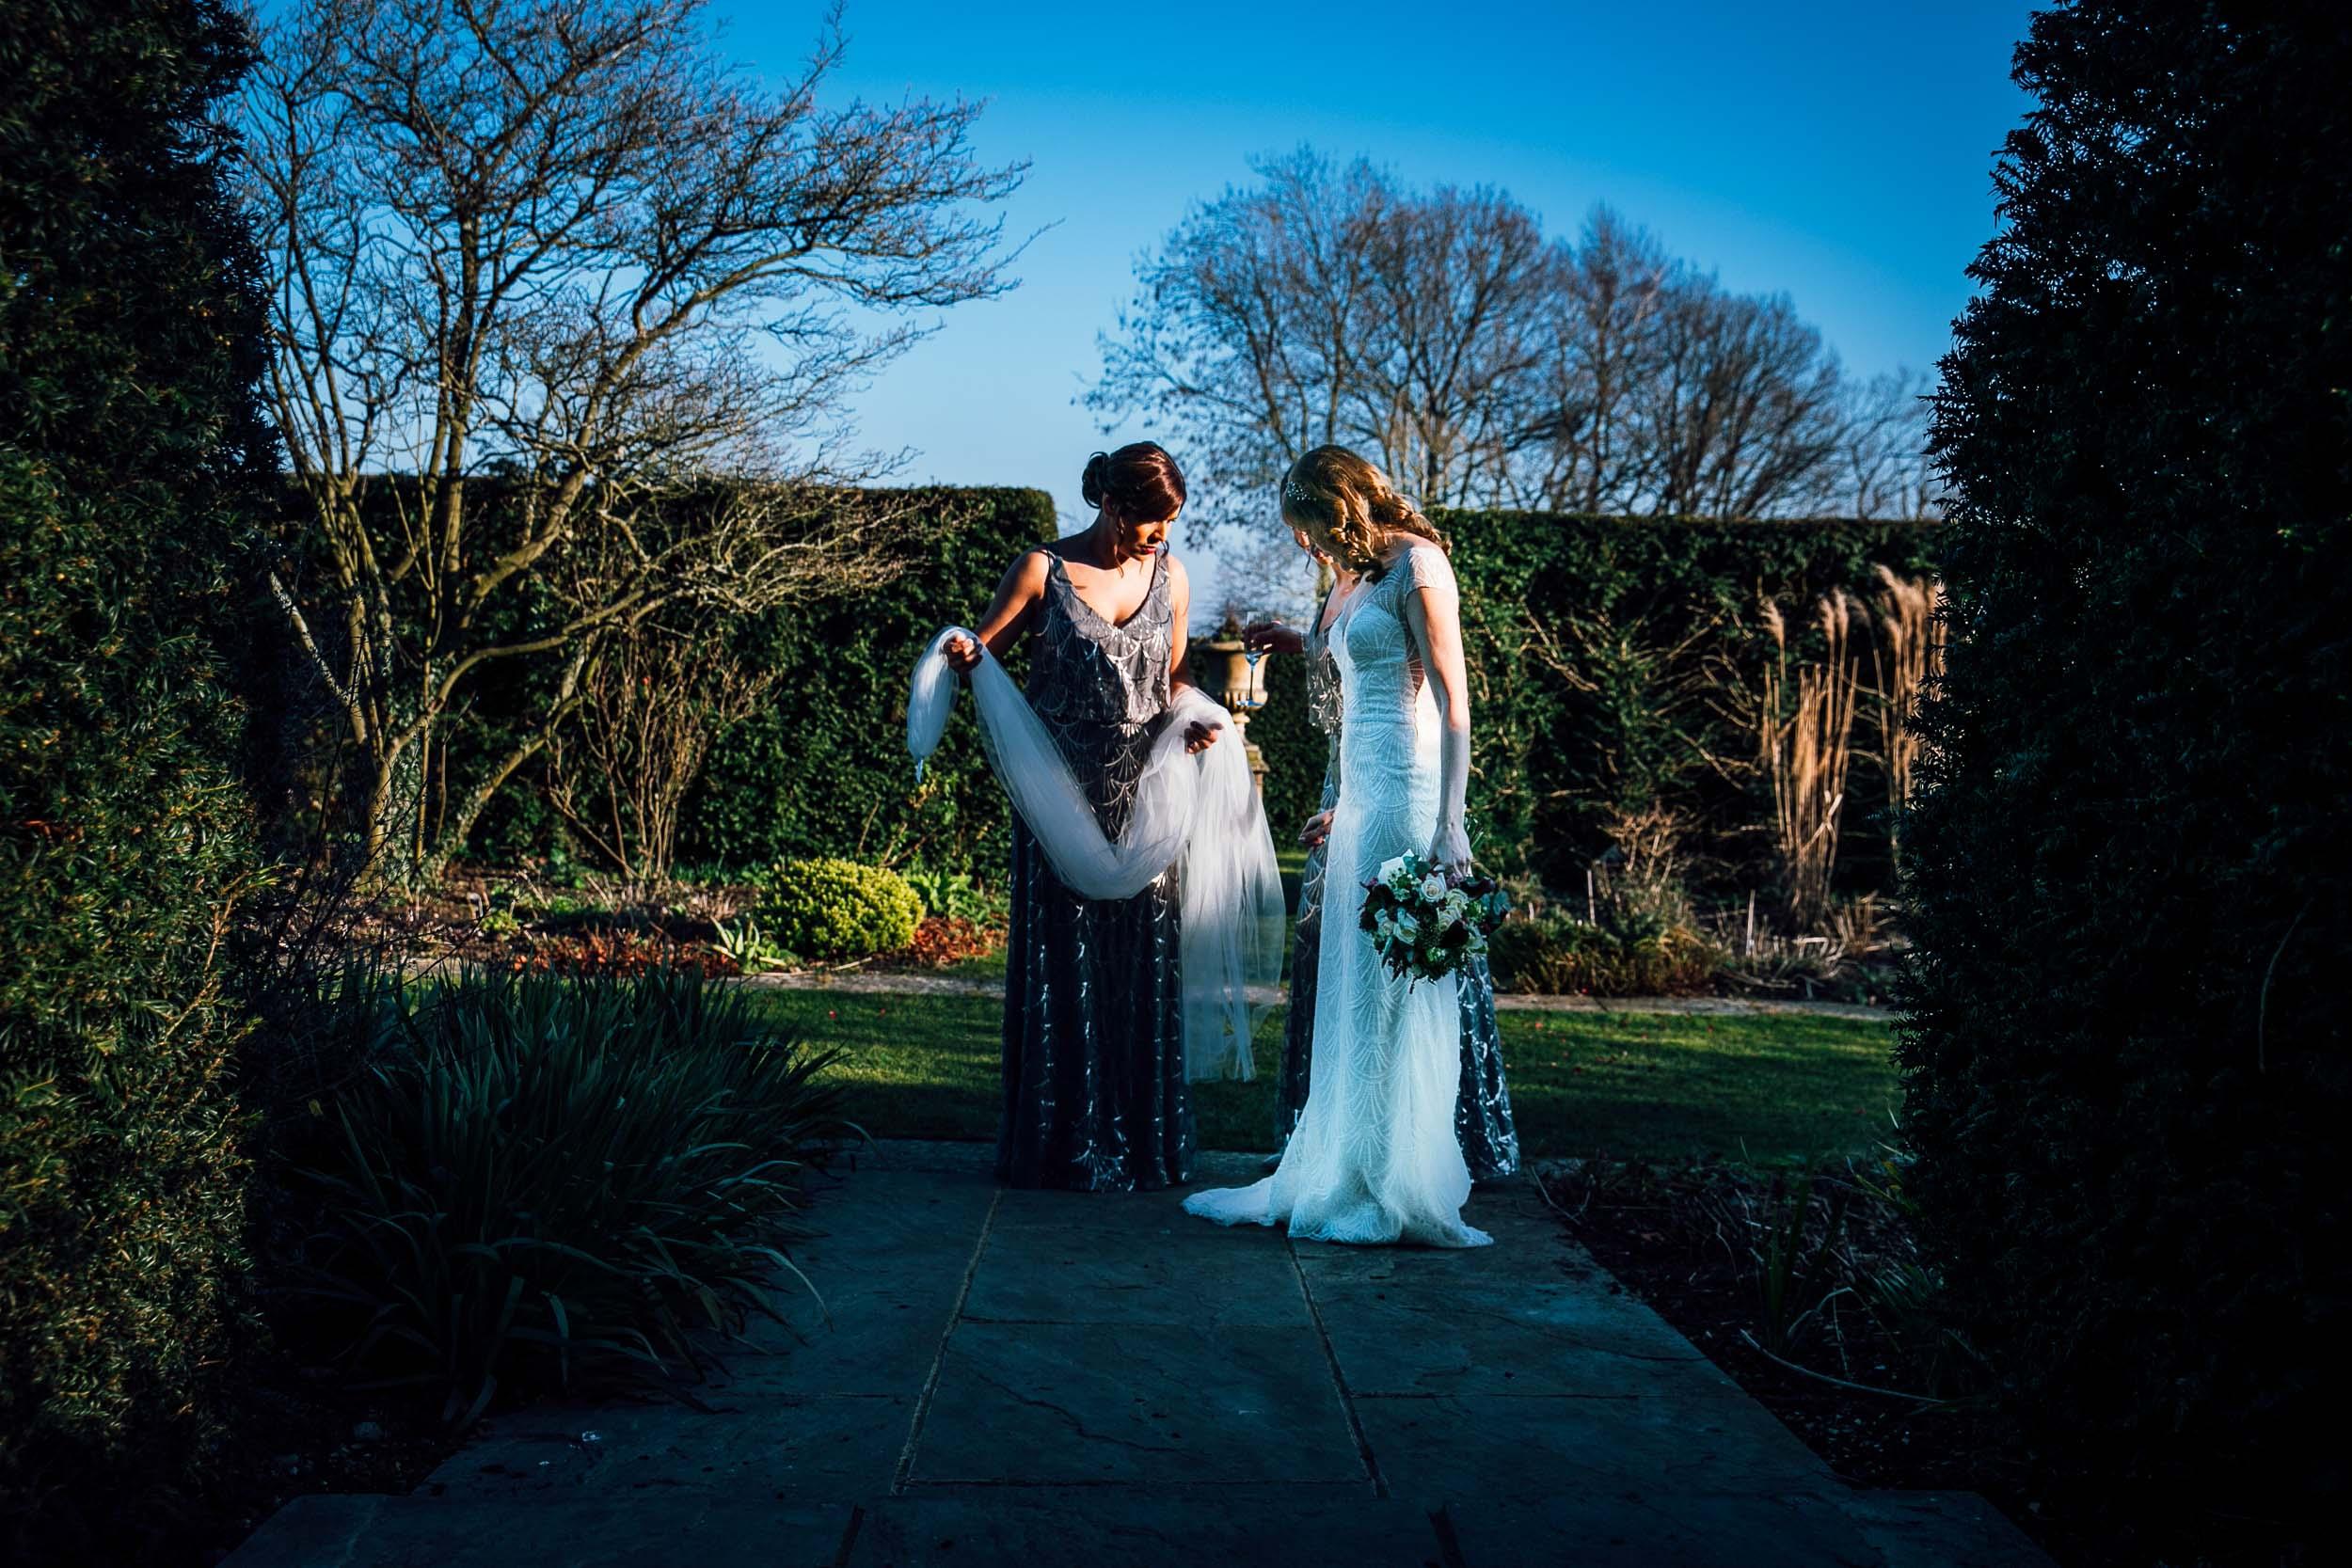 micklefield-hall-wedding-photographer 066.jpg